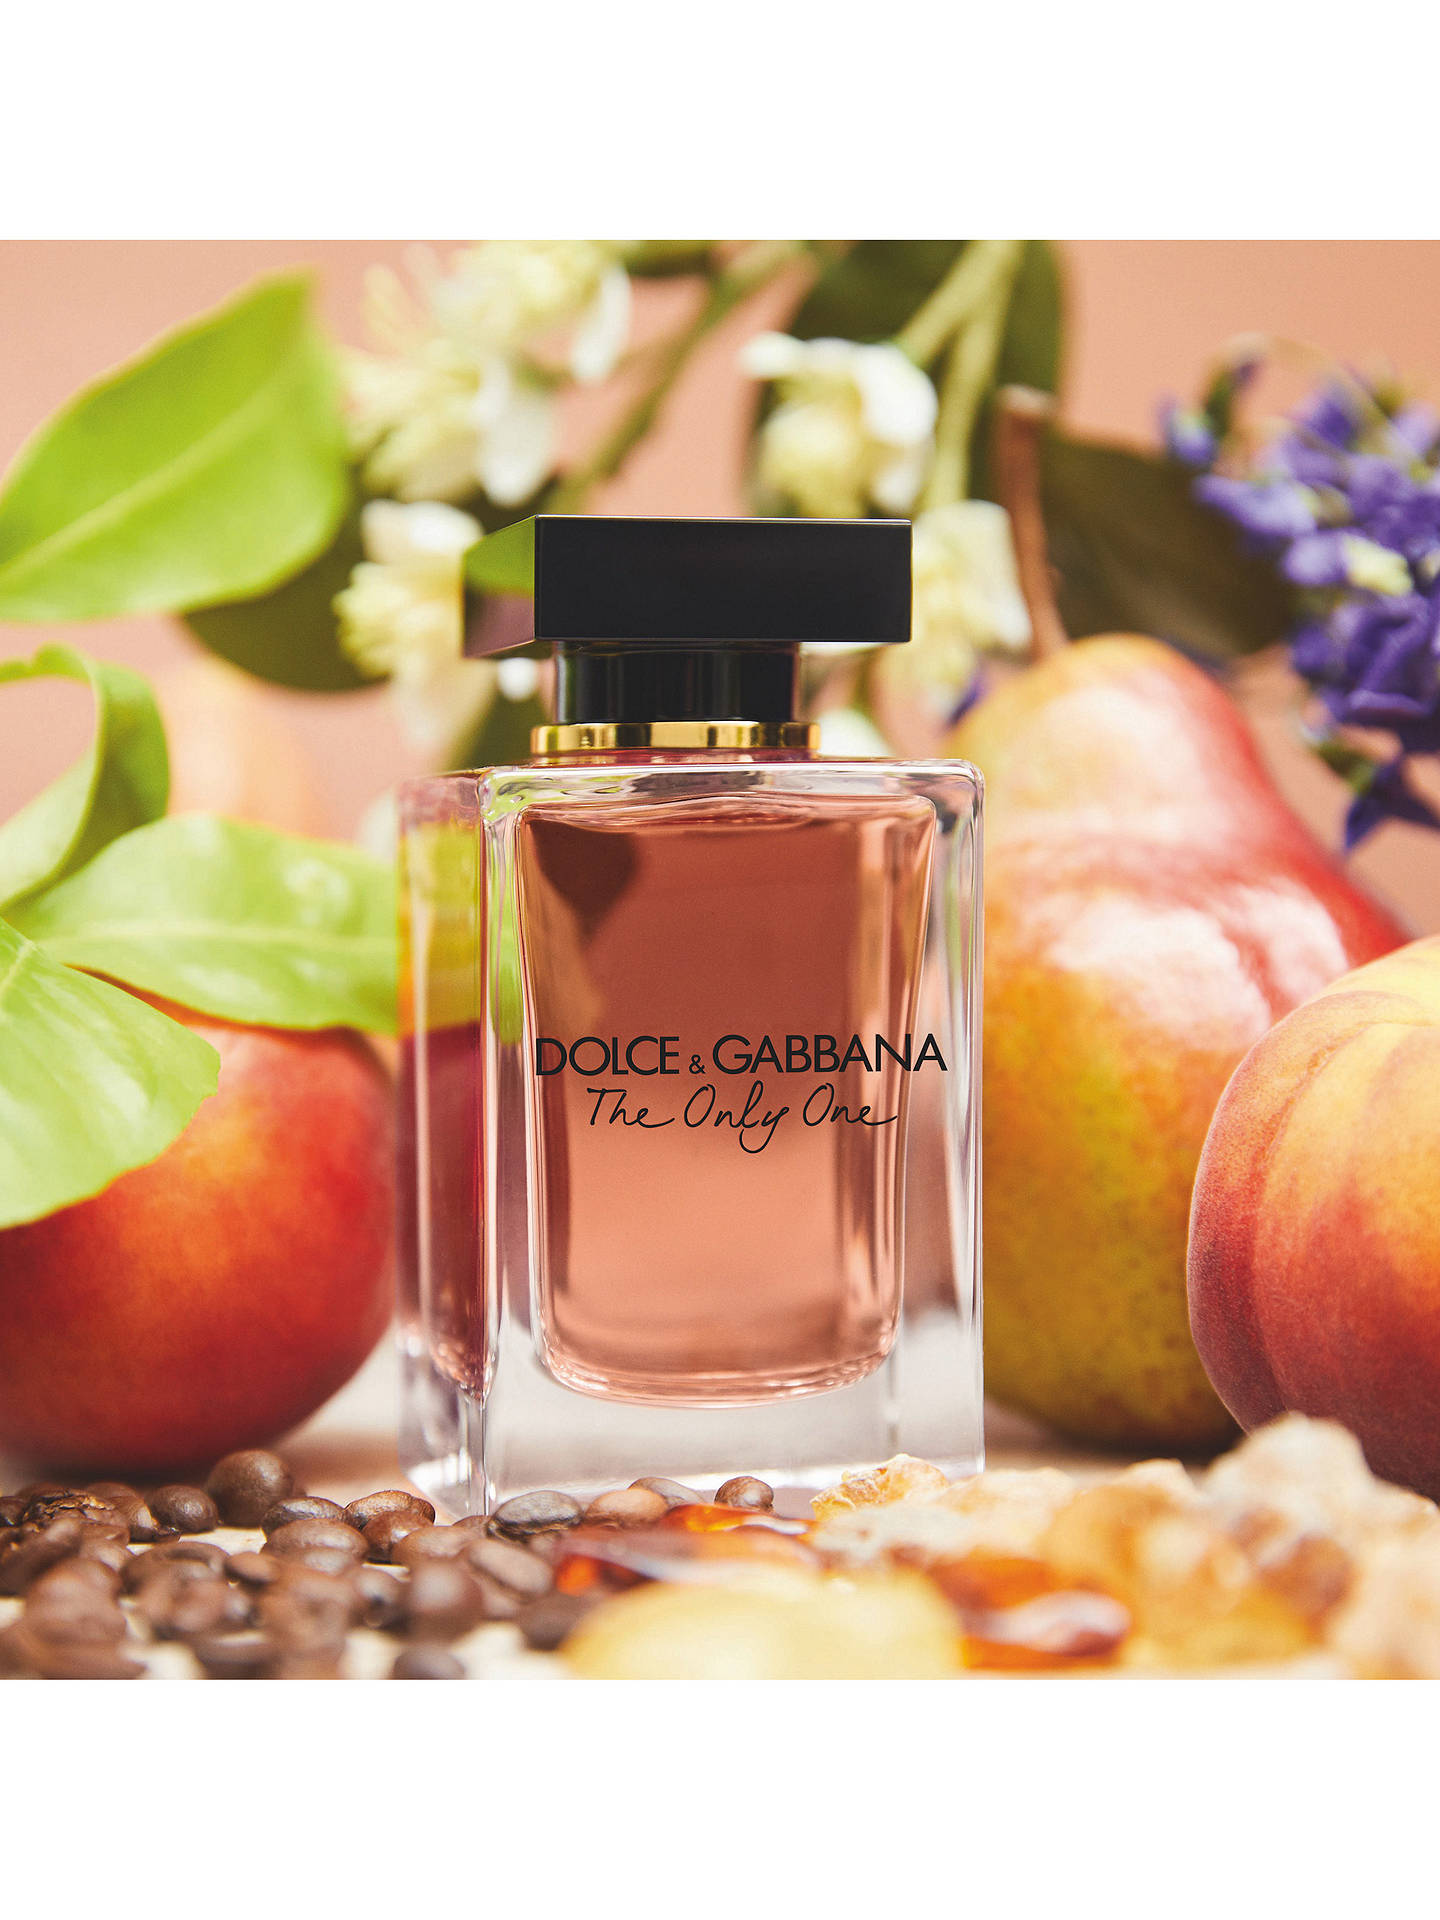 2665227ae1437 Dolce   Gabbana The Only One Eau de Parfum at John Lewis   Partners